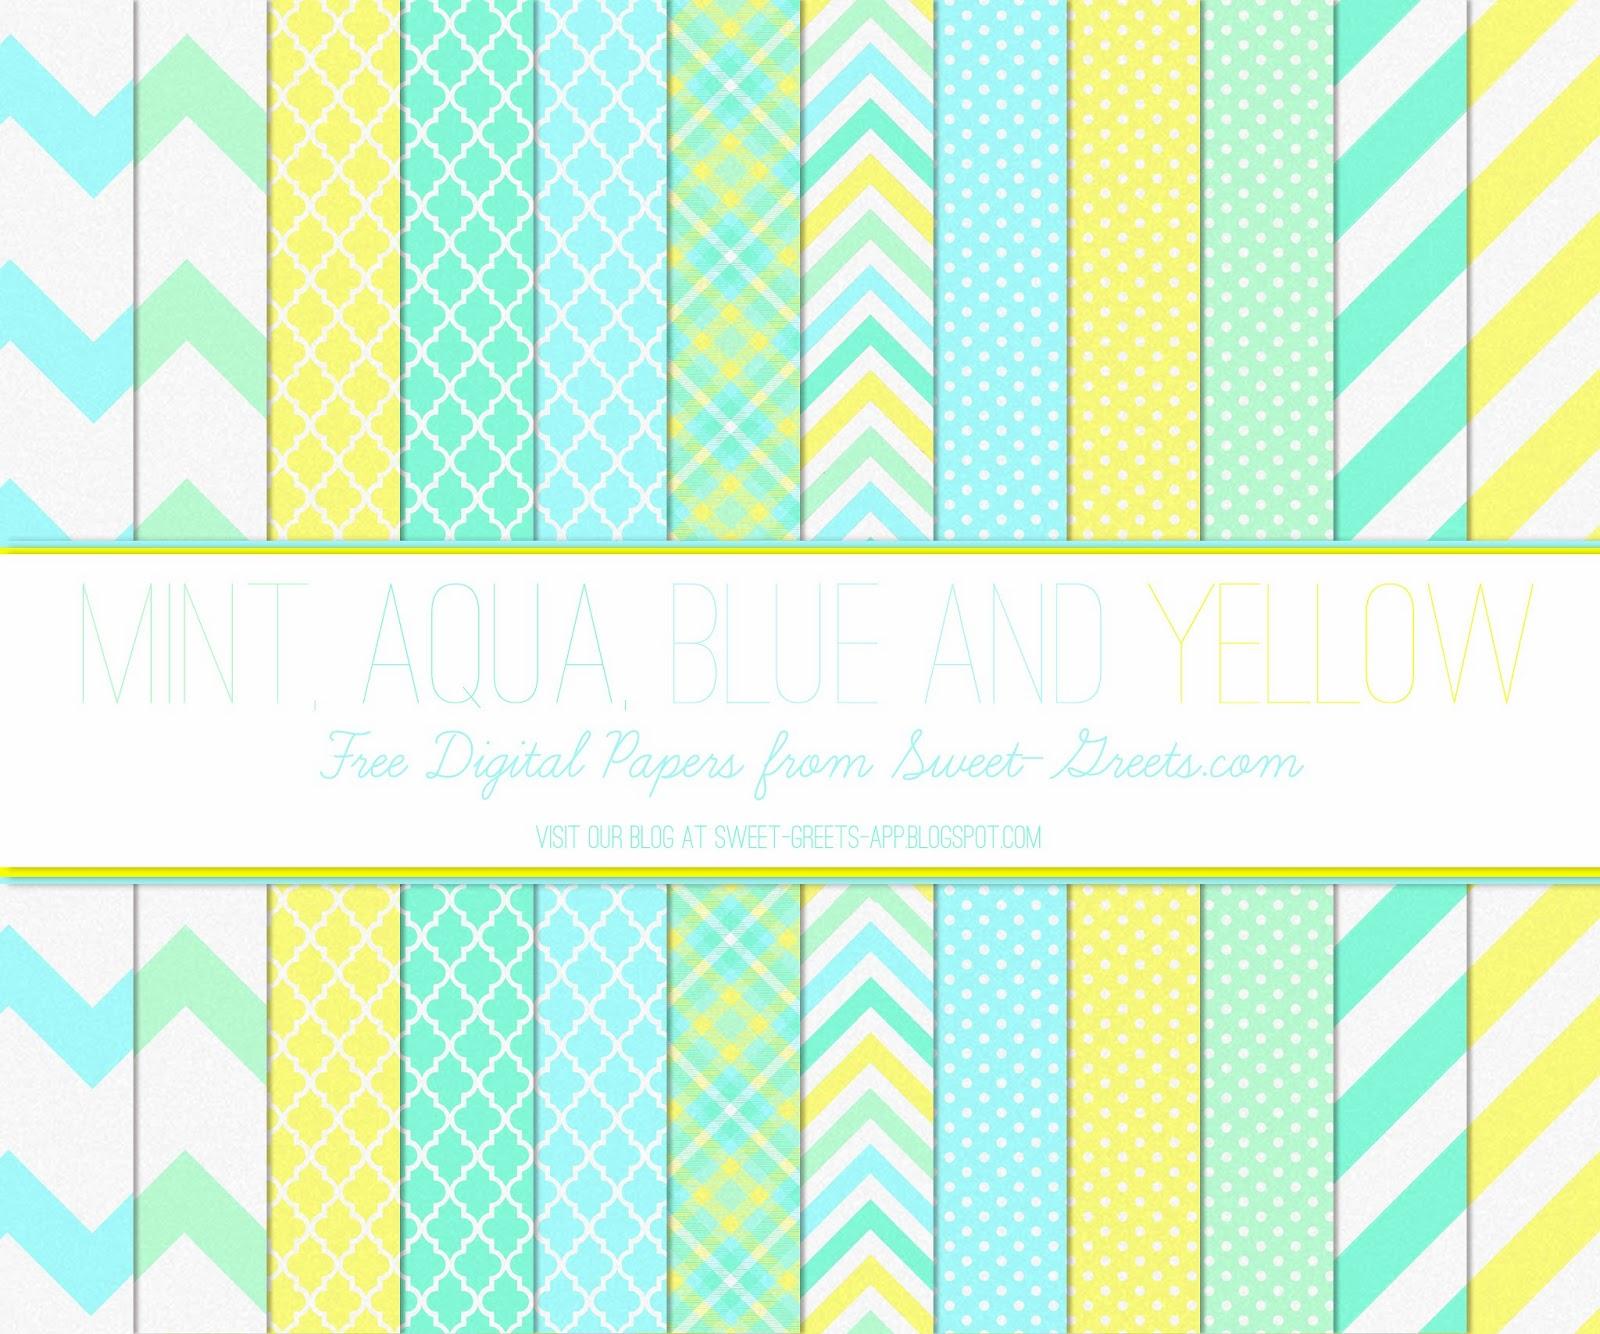 Free Digital Paper: Mint, Aqua, Blue and Yellow